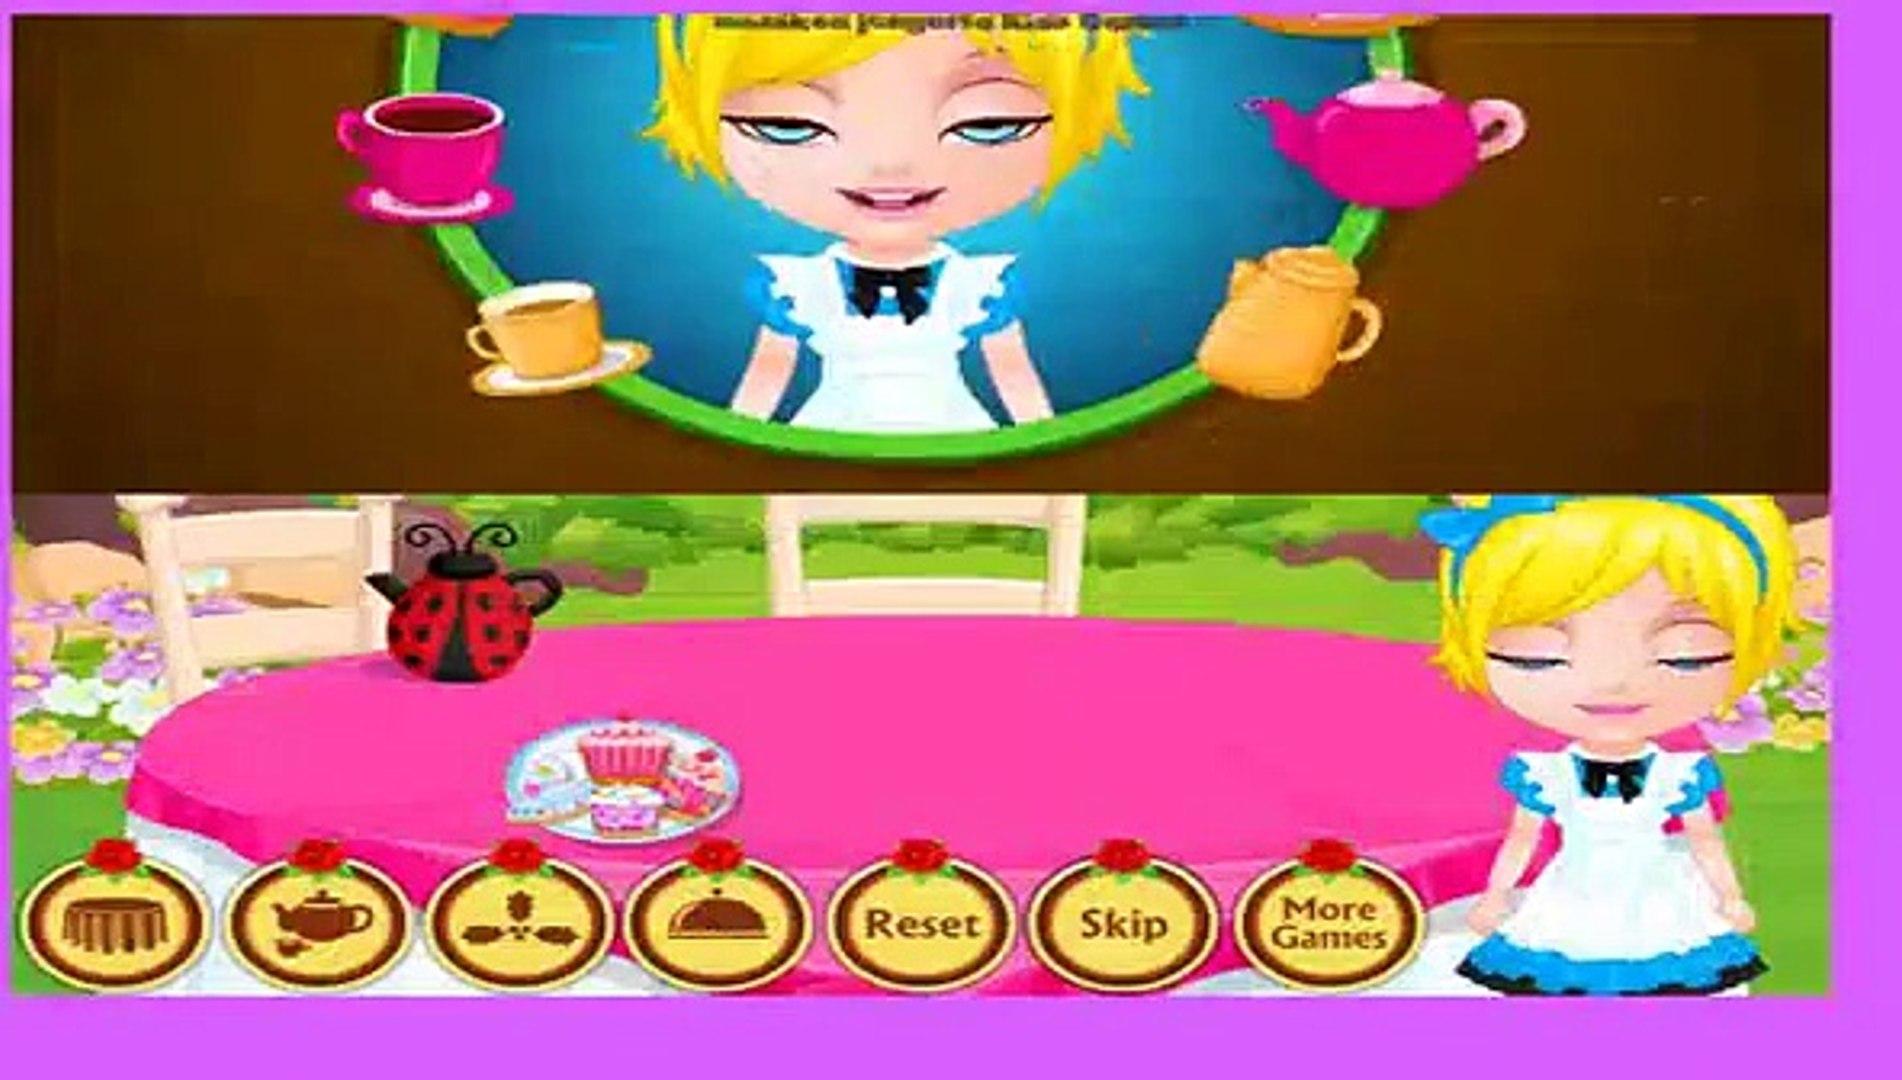 Barbie Barbie Games Babie Games Baby Barbie Tea Party Barbie Game Movie Games Movie